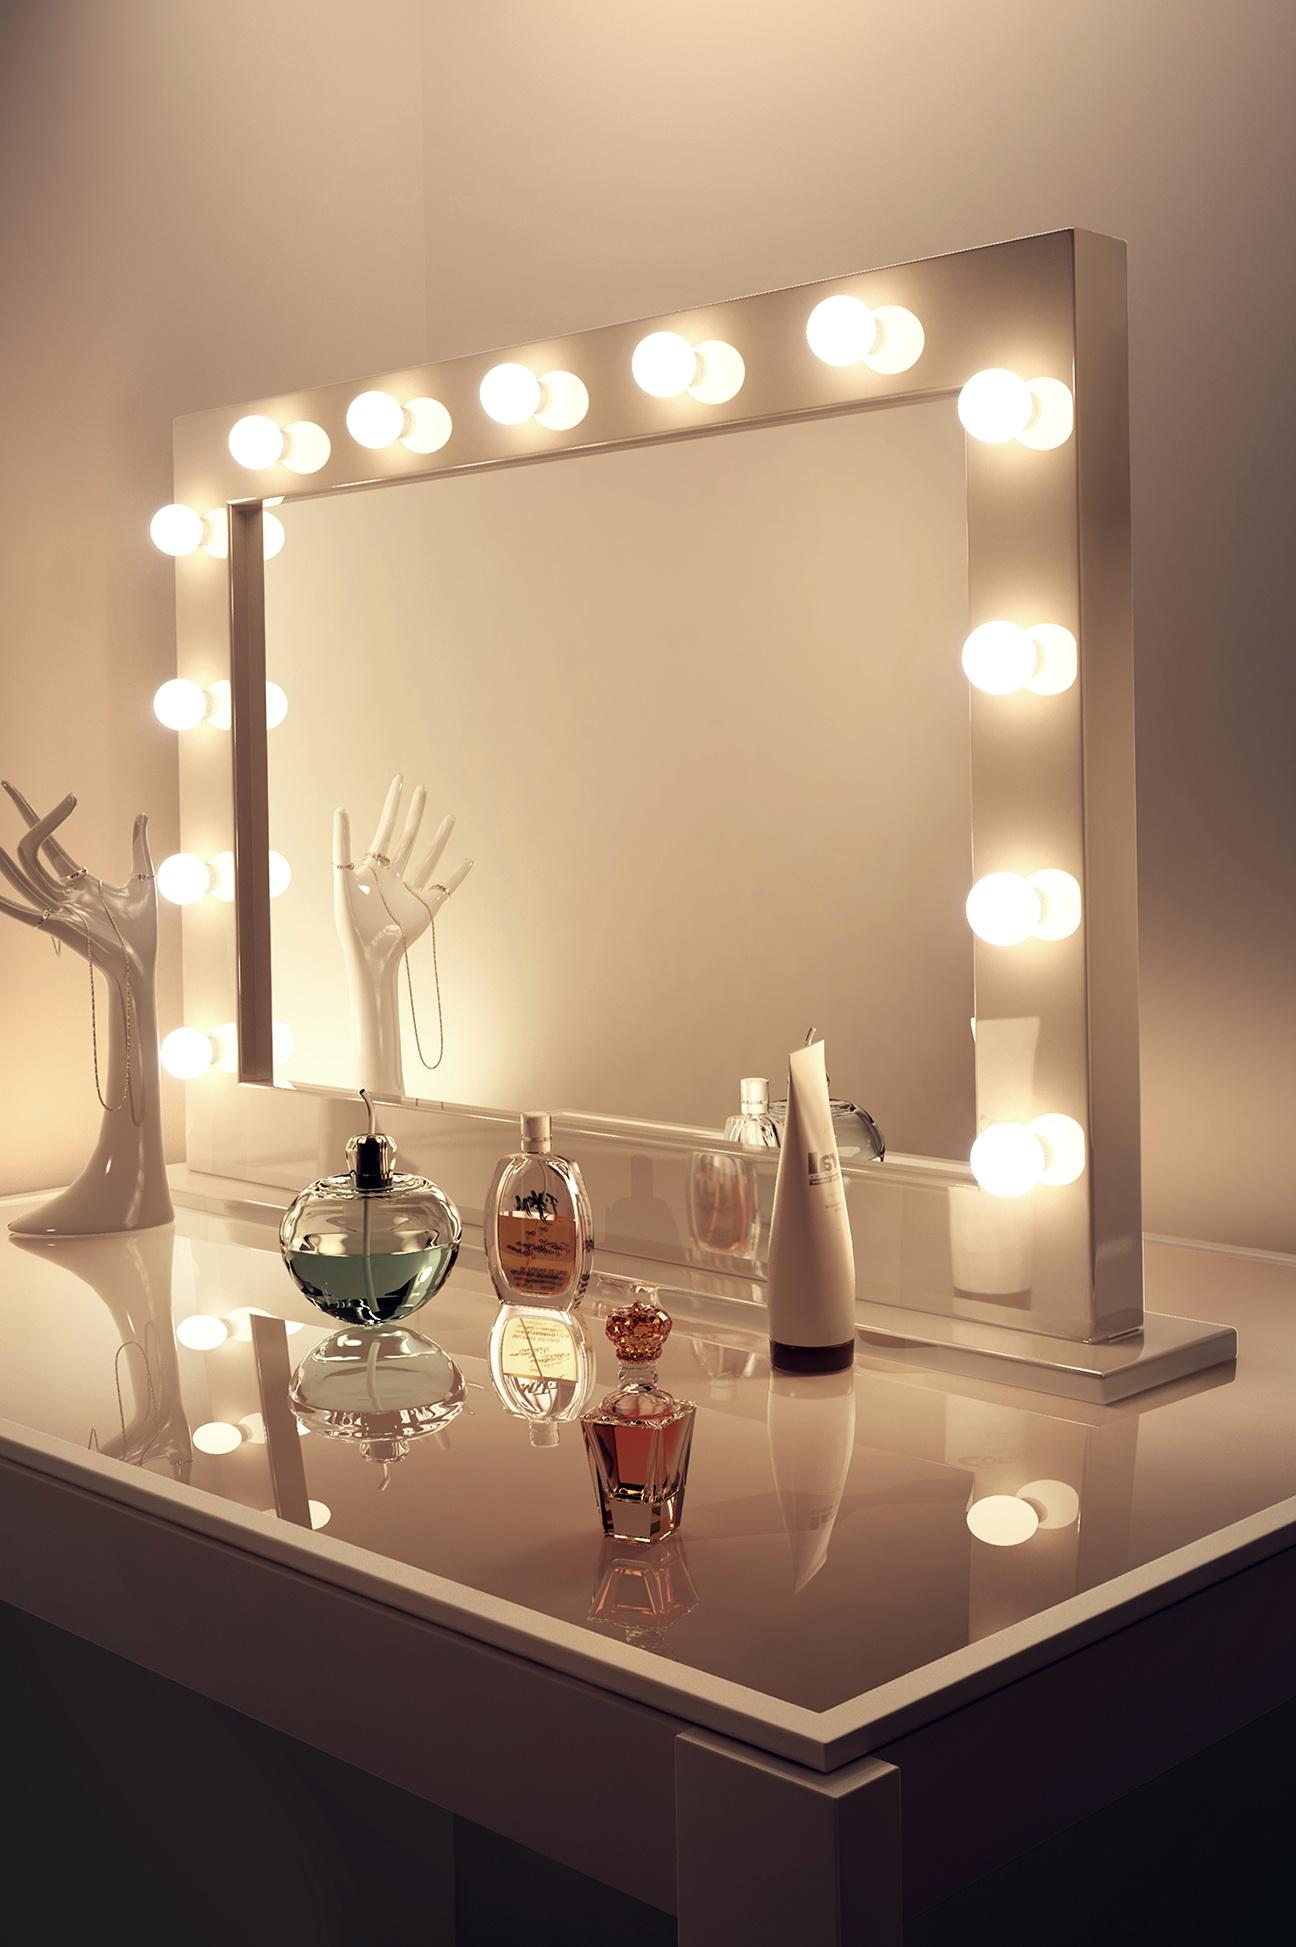 Vanity mirror ideas Ikea Vanity Makeup Mirror With Light Bulbs Home Design Ideas Absujest 50 Vanity Mirror With Light Bulbs Up To 70 Off Visual Hunt